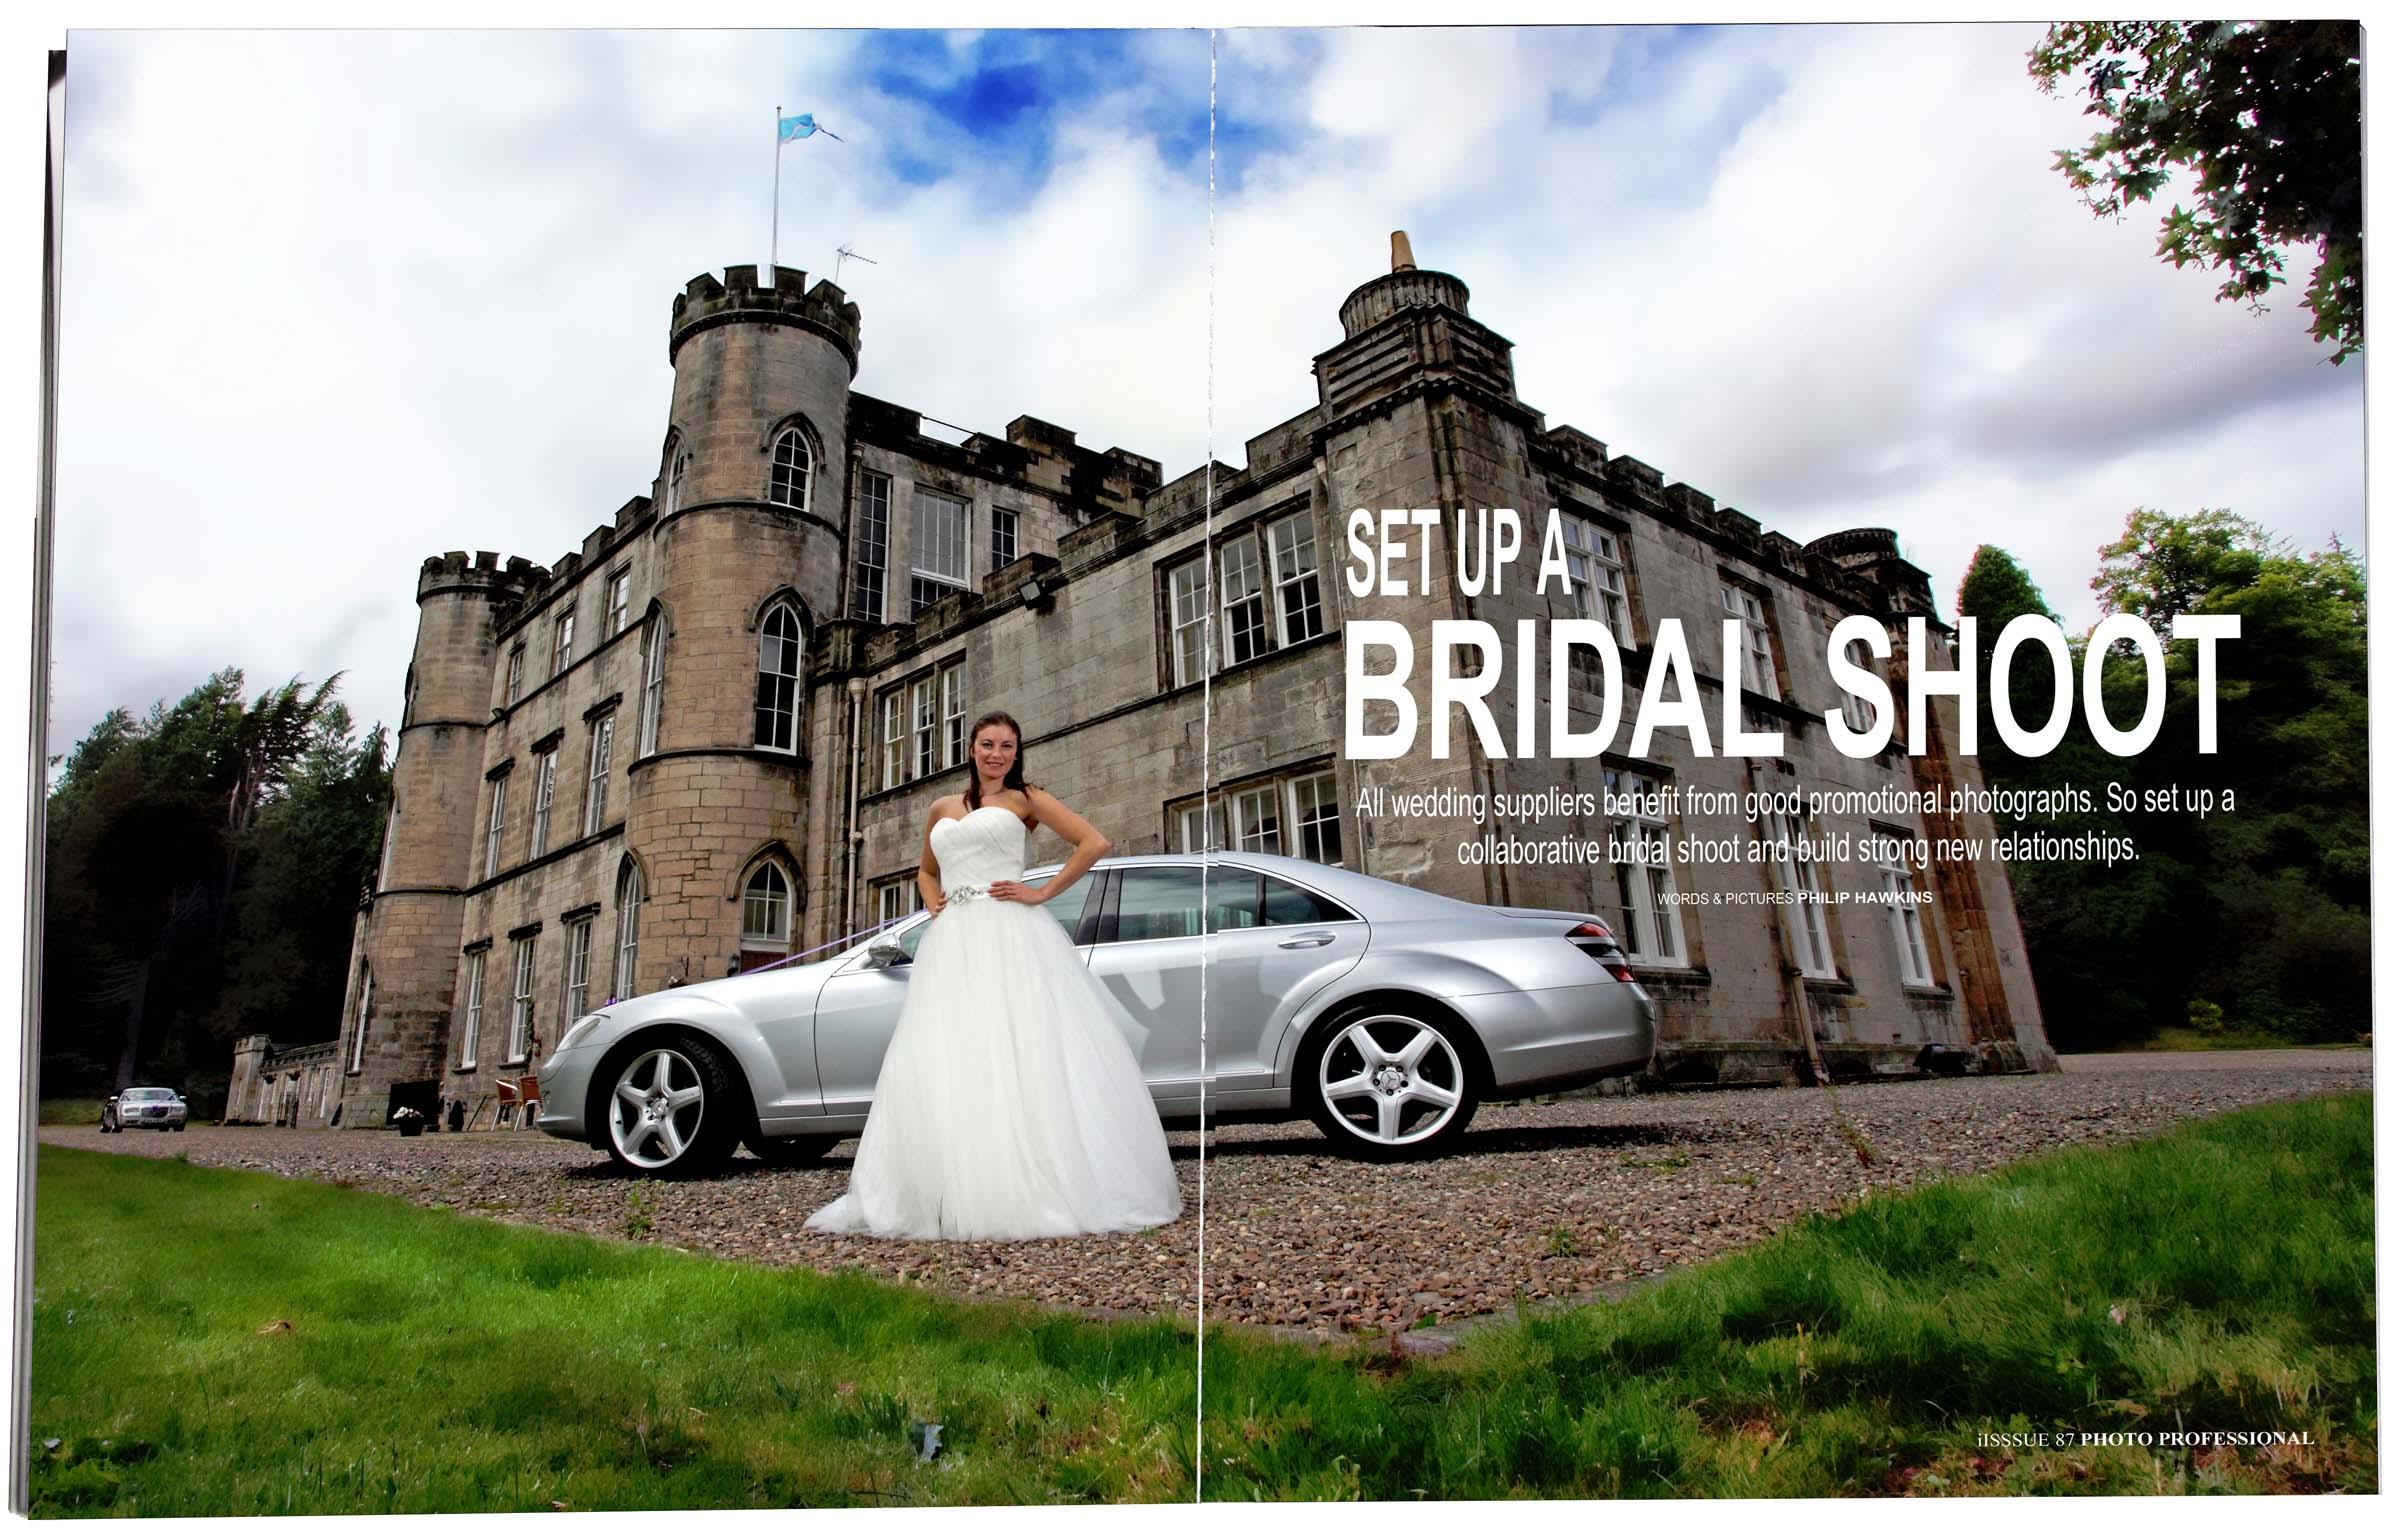 Bridal Shoot magazine feature